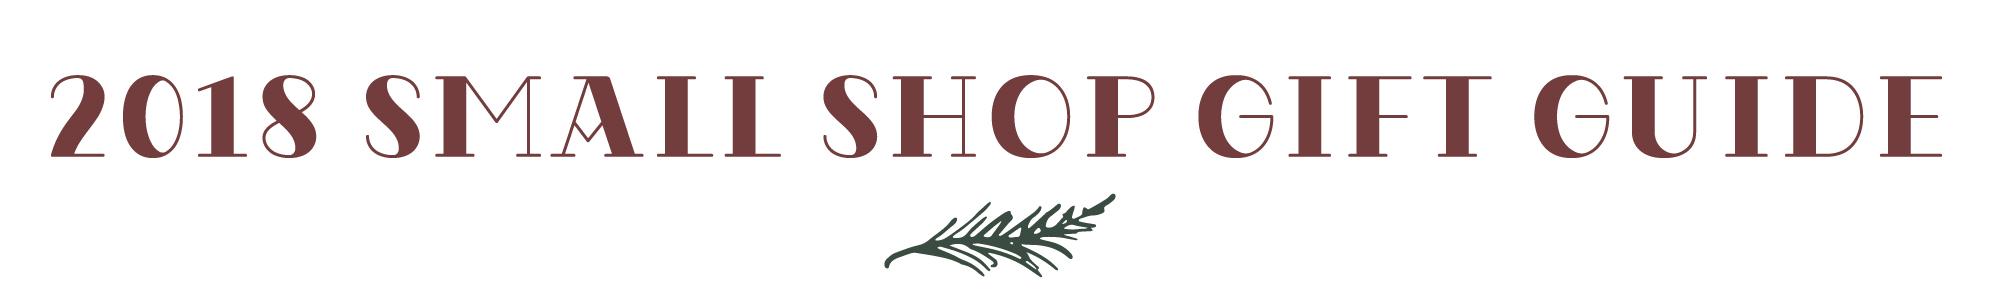 ShopSmallGuide.jpg